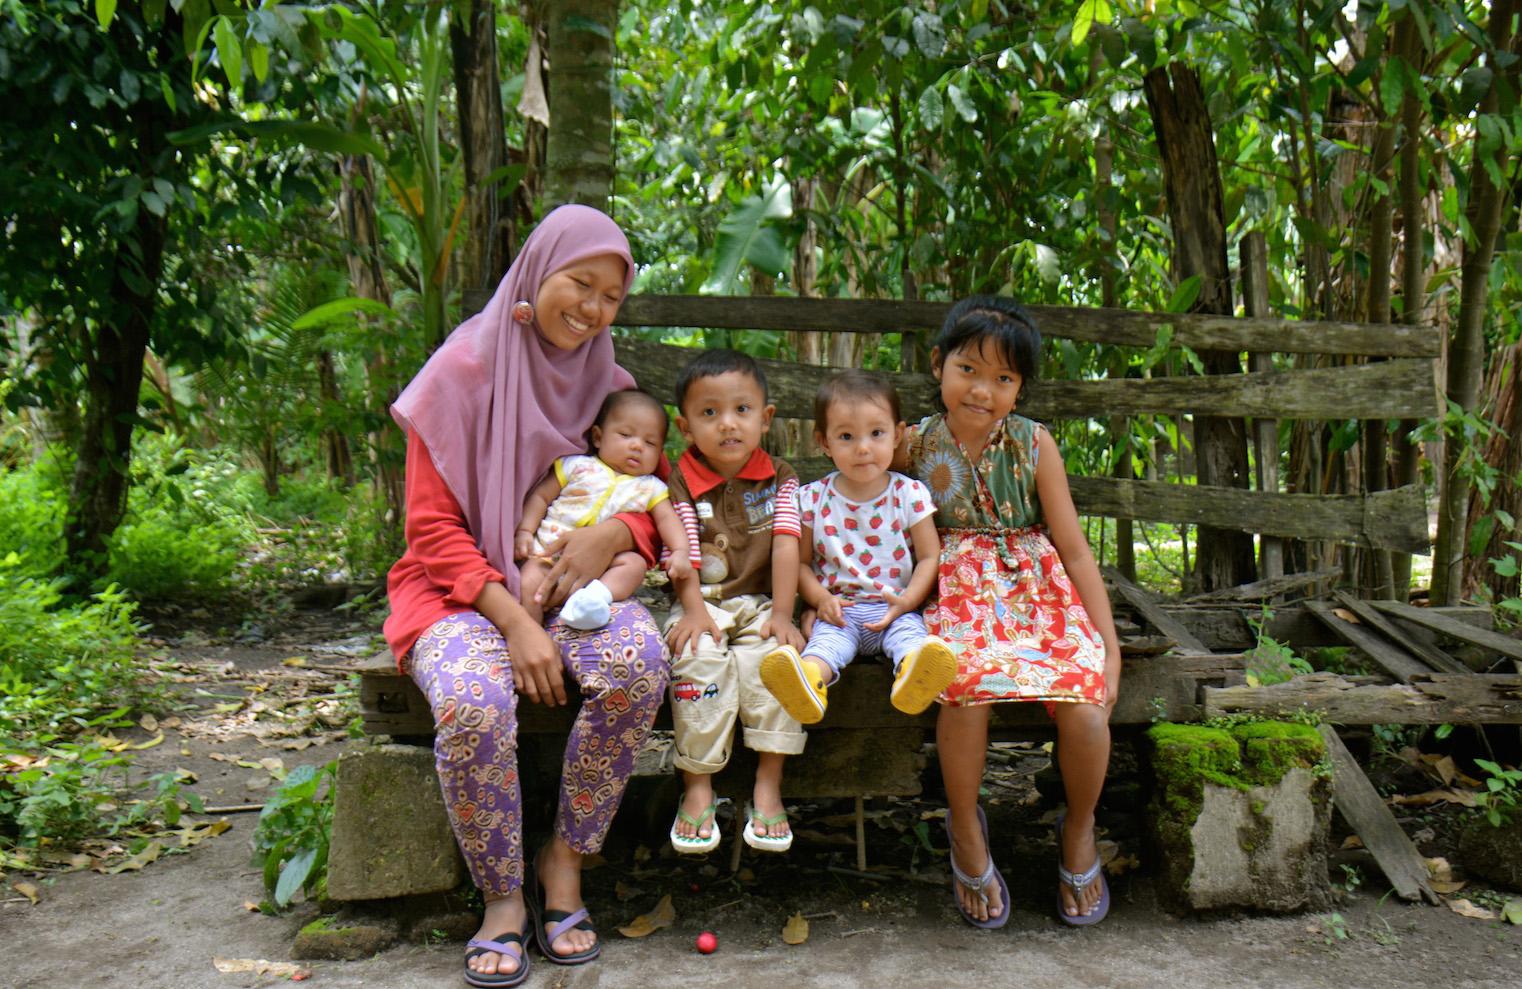 02.Matka Nomadka - podroz z dzieckiem - Indonezja